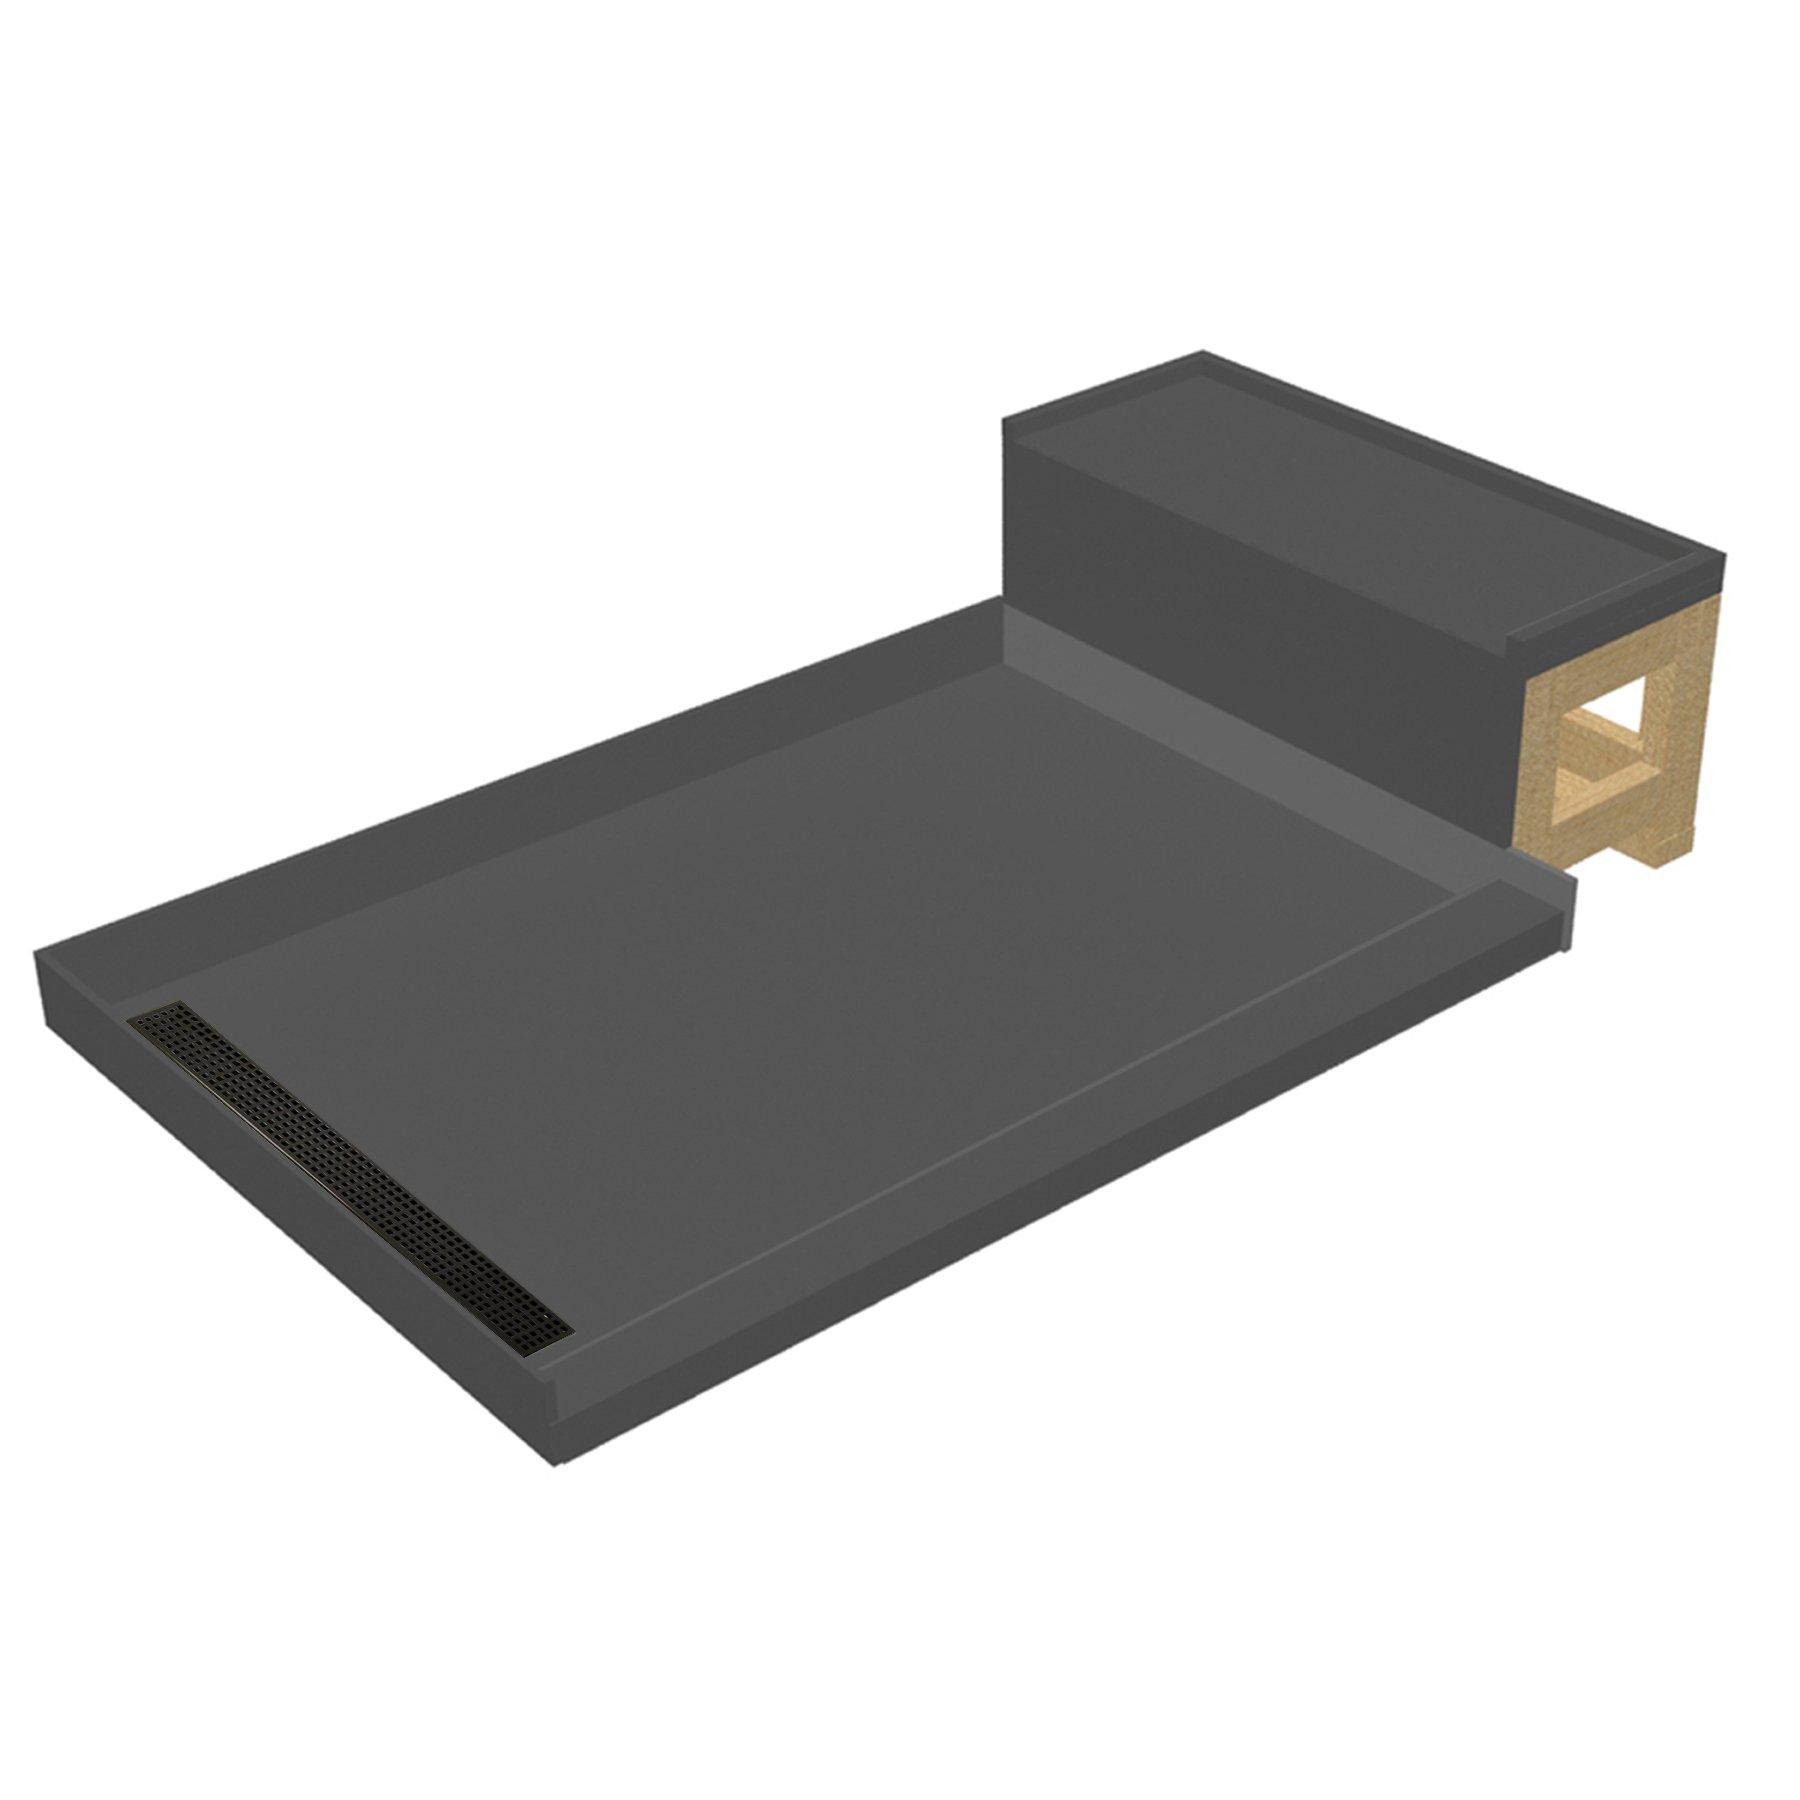 Tile Redi USA RT3048L-OB-RB30-KIT-2.5 Base'N Bench Shower Pan